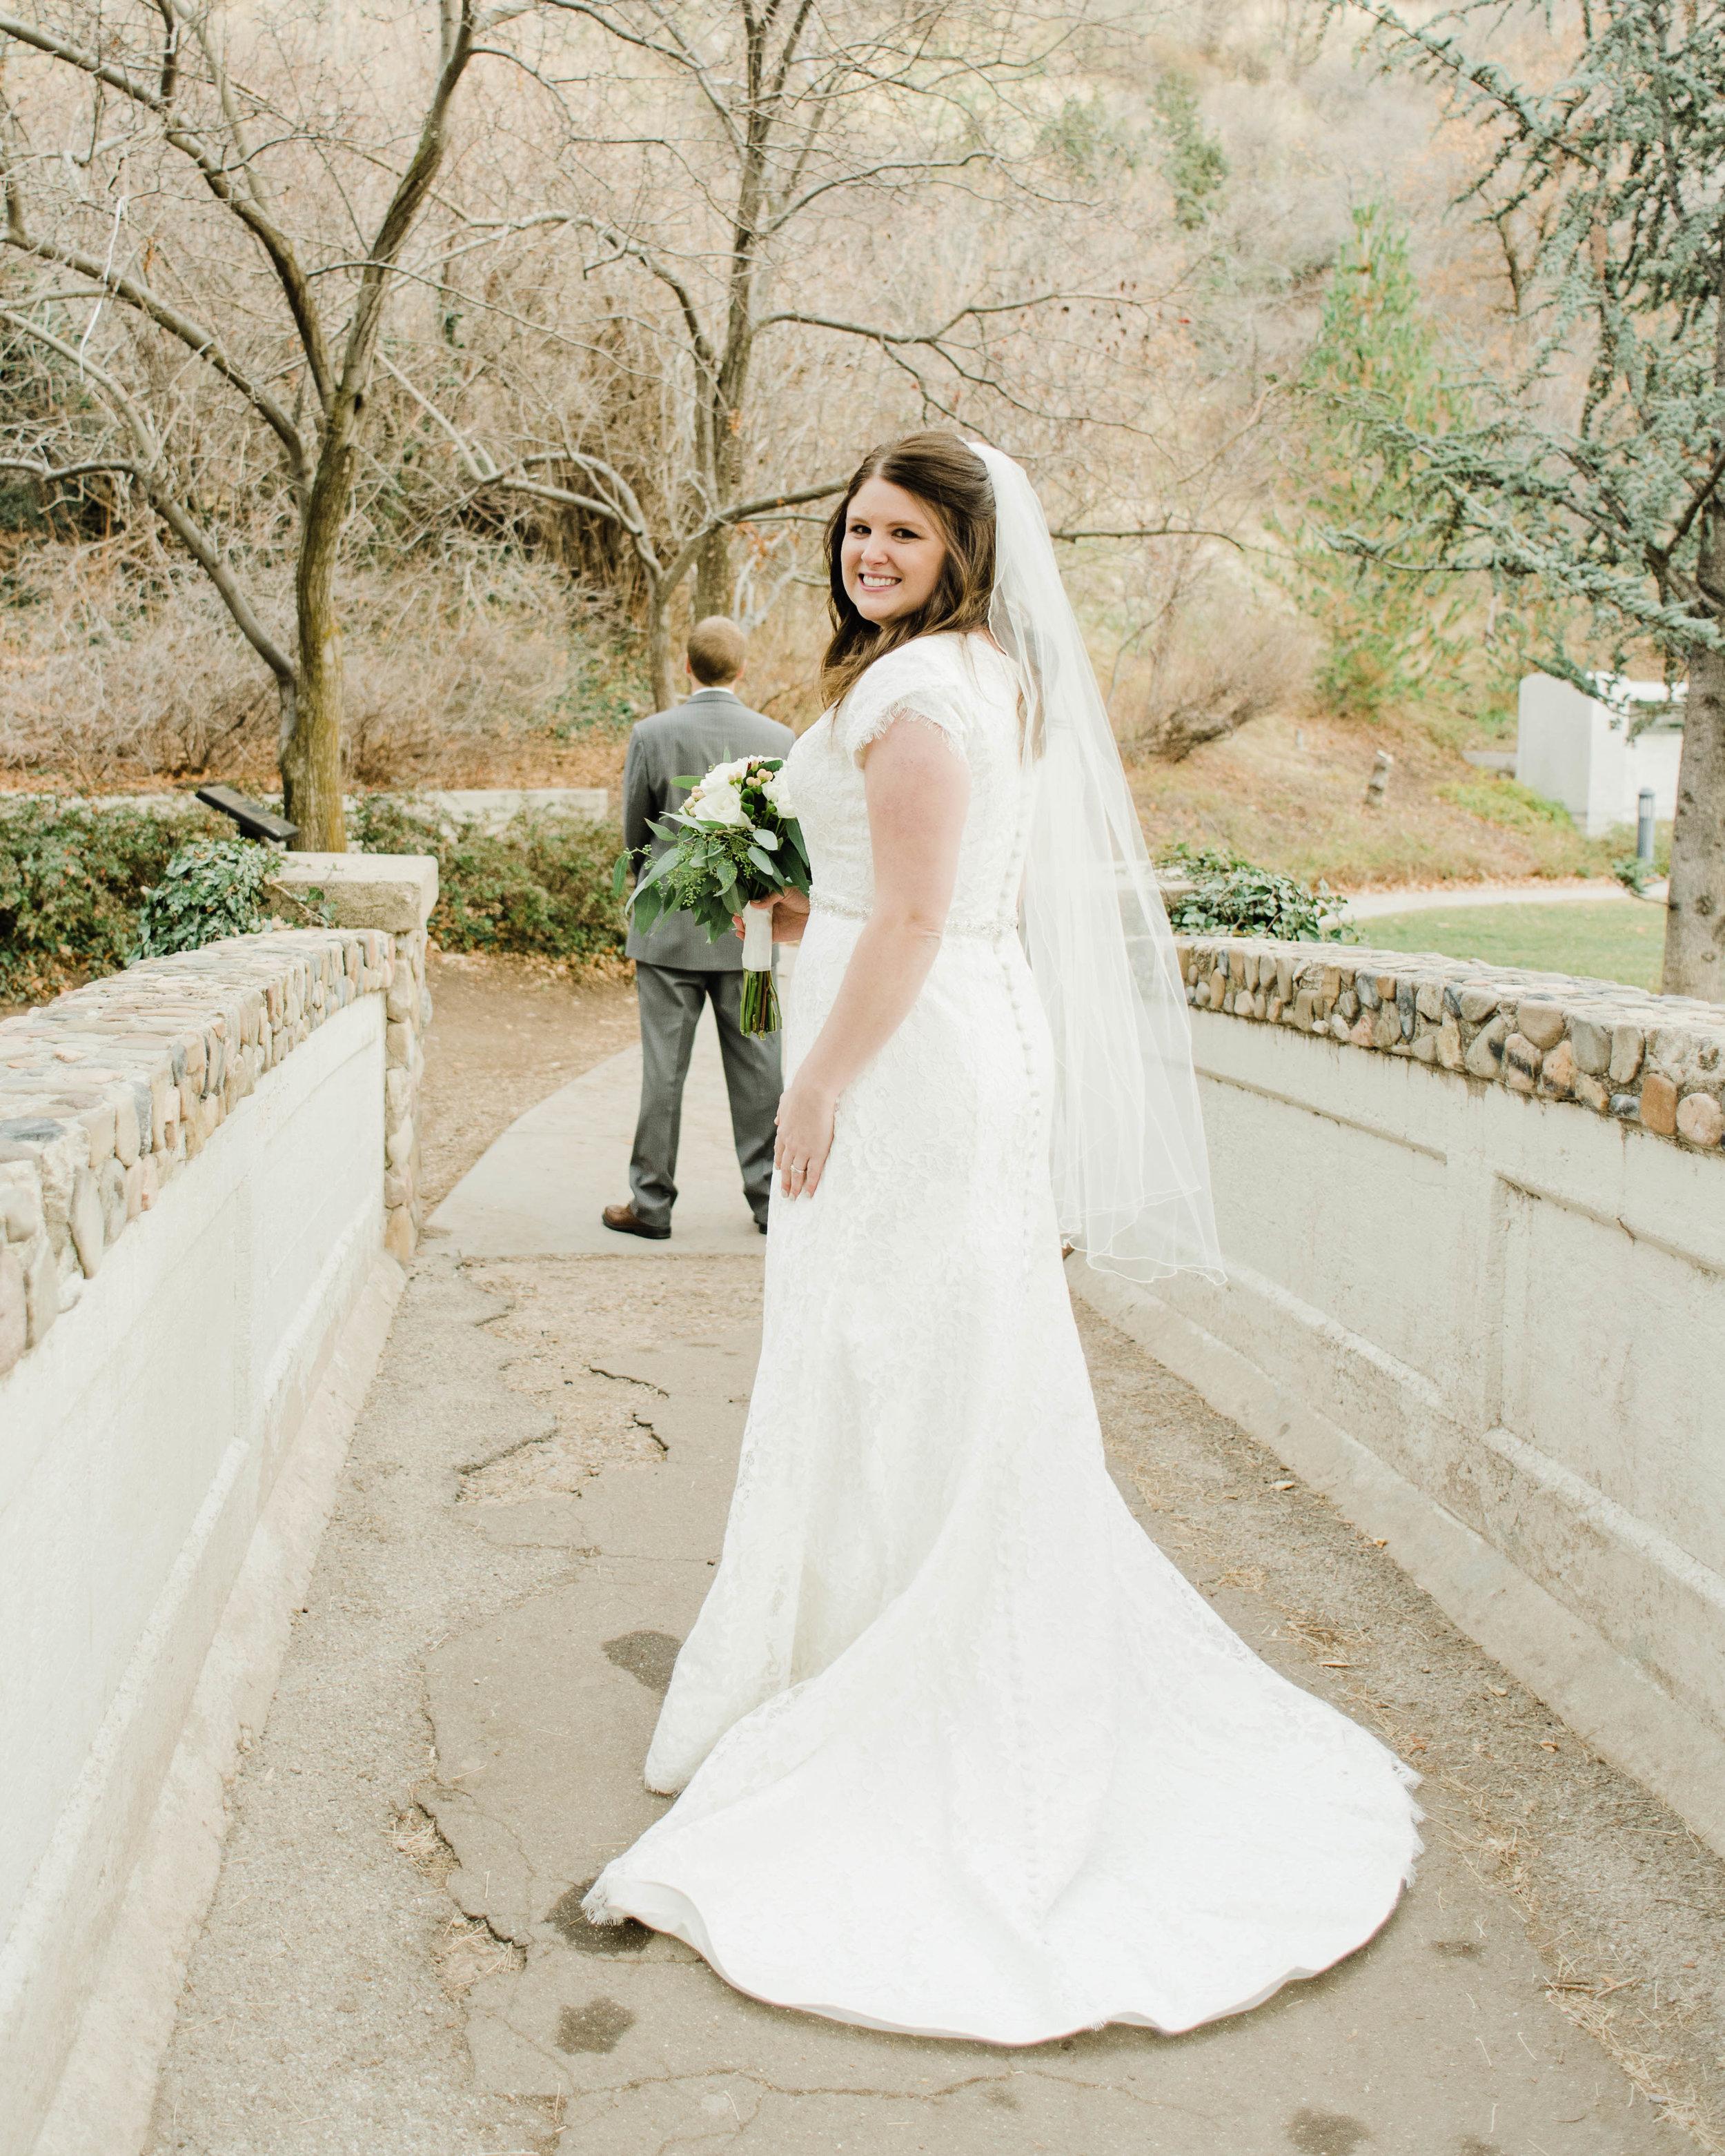 LINDSAY+BRAD-BRIDALS-Sadie_Banks_Photography-8.jpg